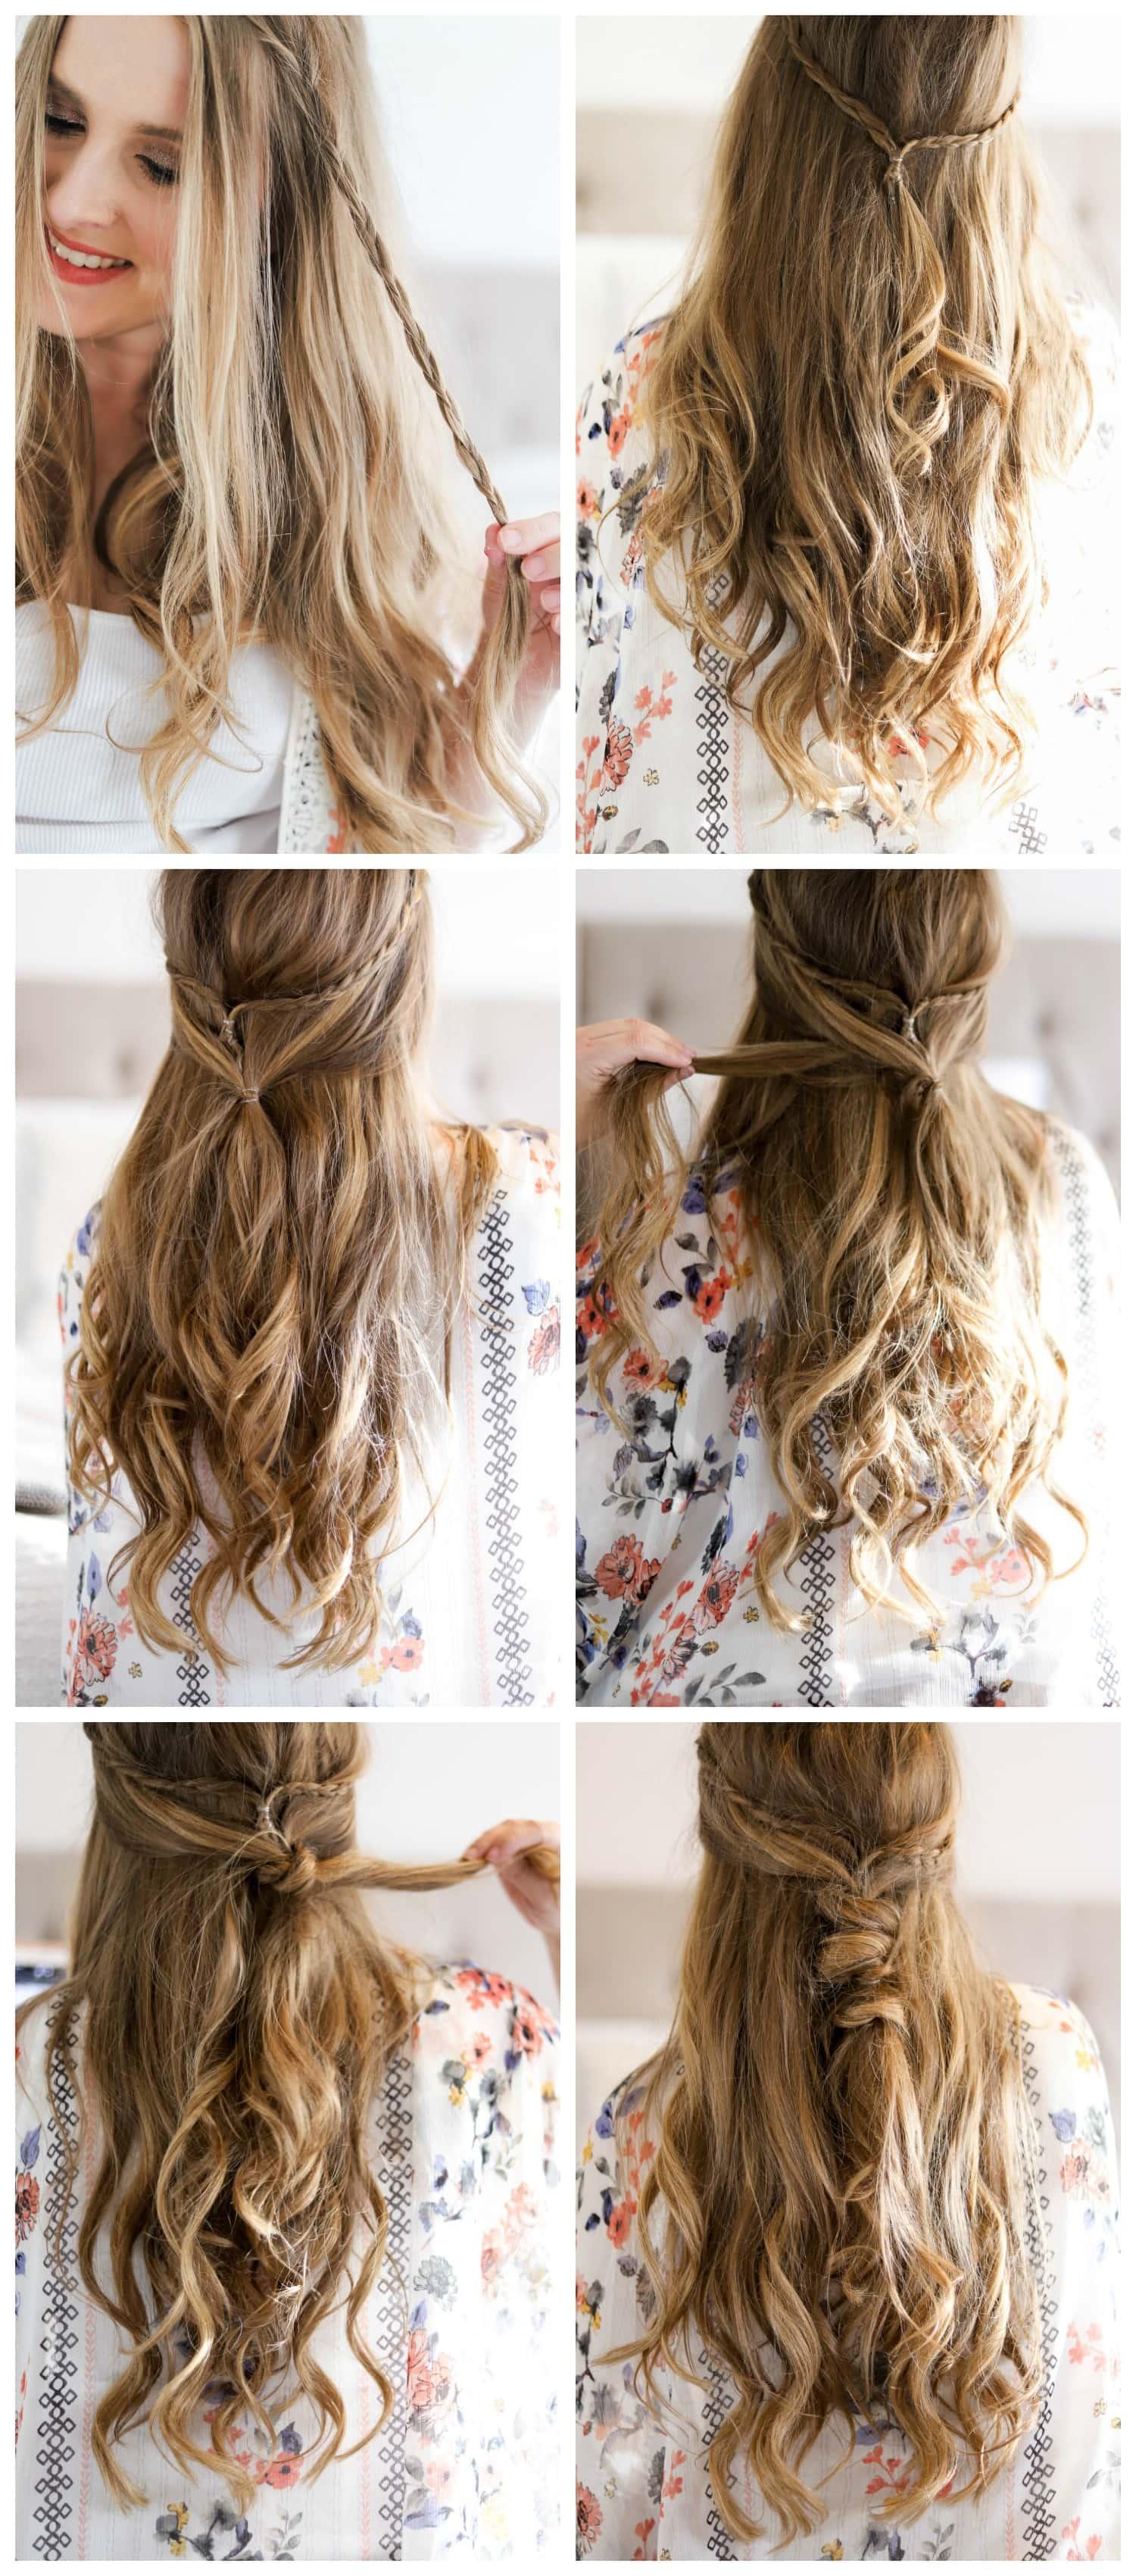 Smiling woman, beautiful easy boho hair tutorial, cute hair tutorial, dirty blonde hair, Ashley Brook Nicholas, Dove dry shampoo